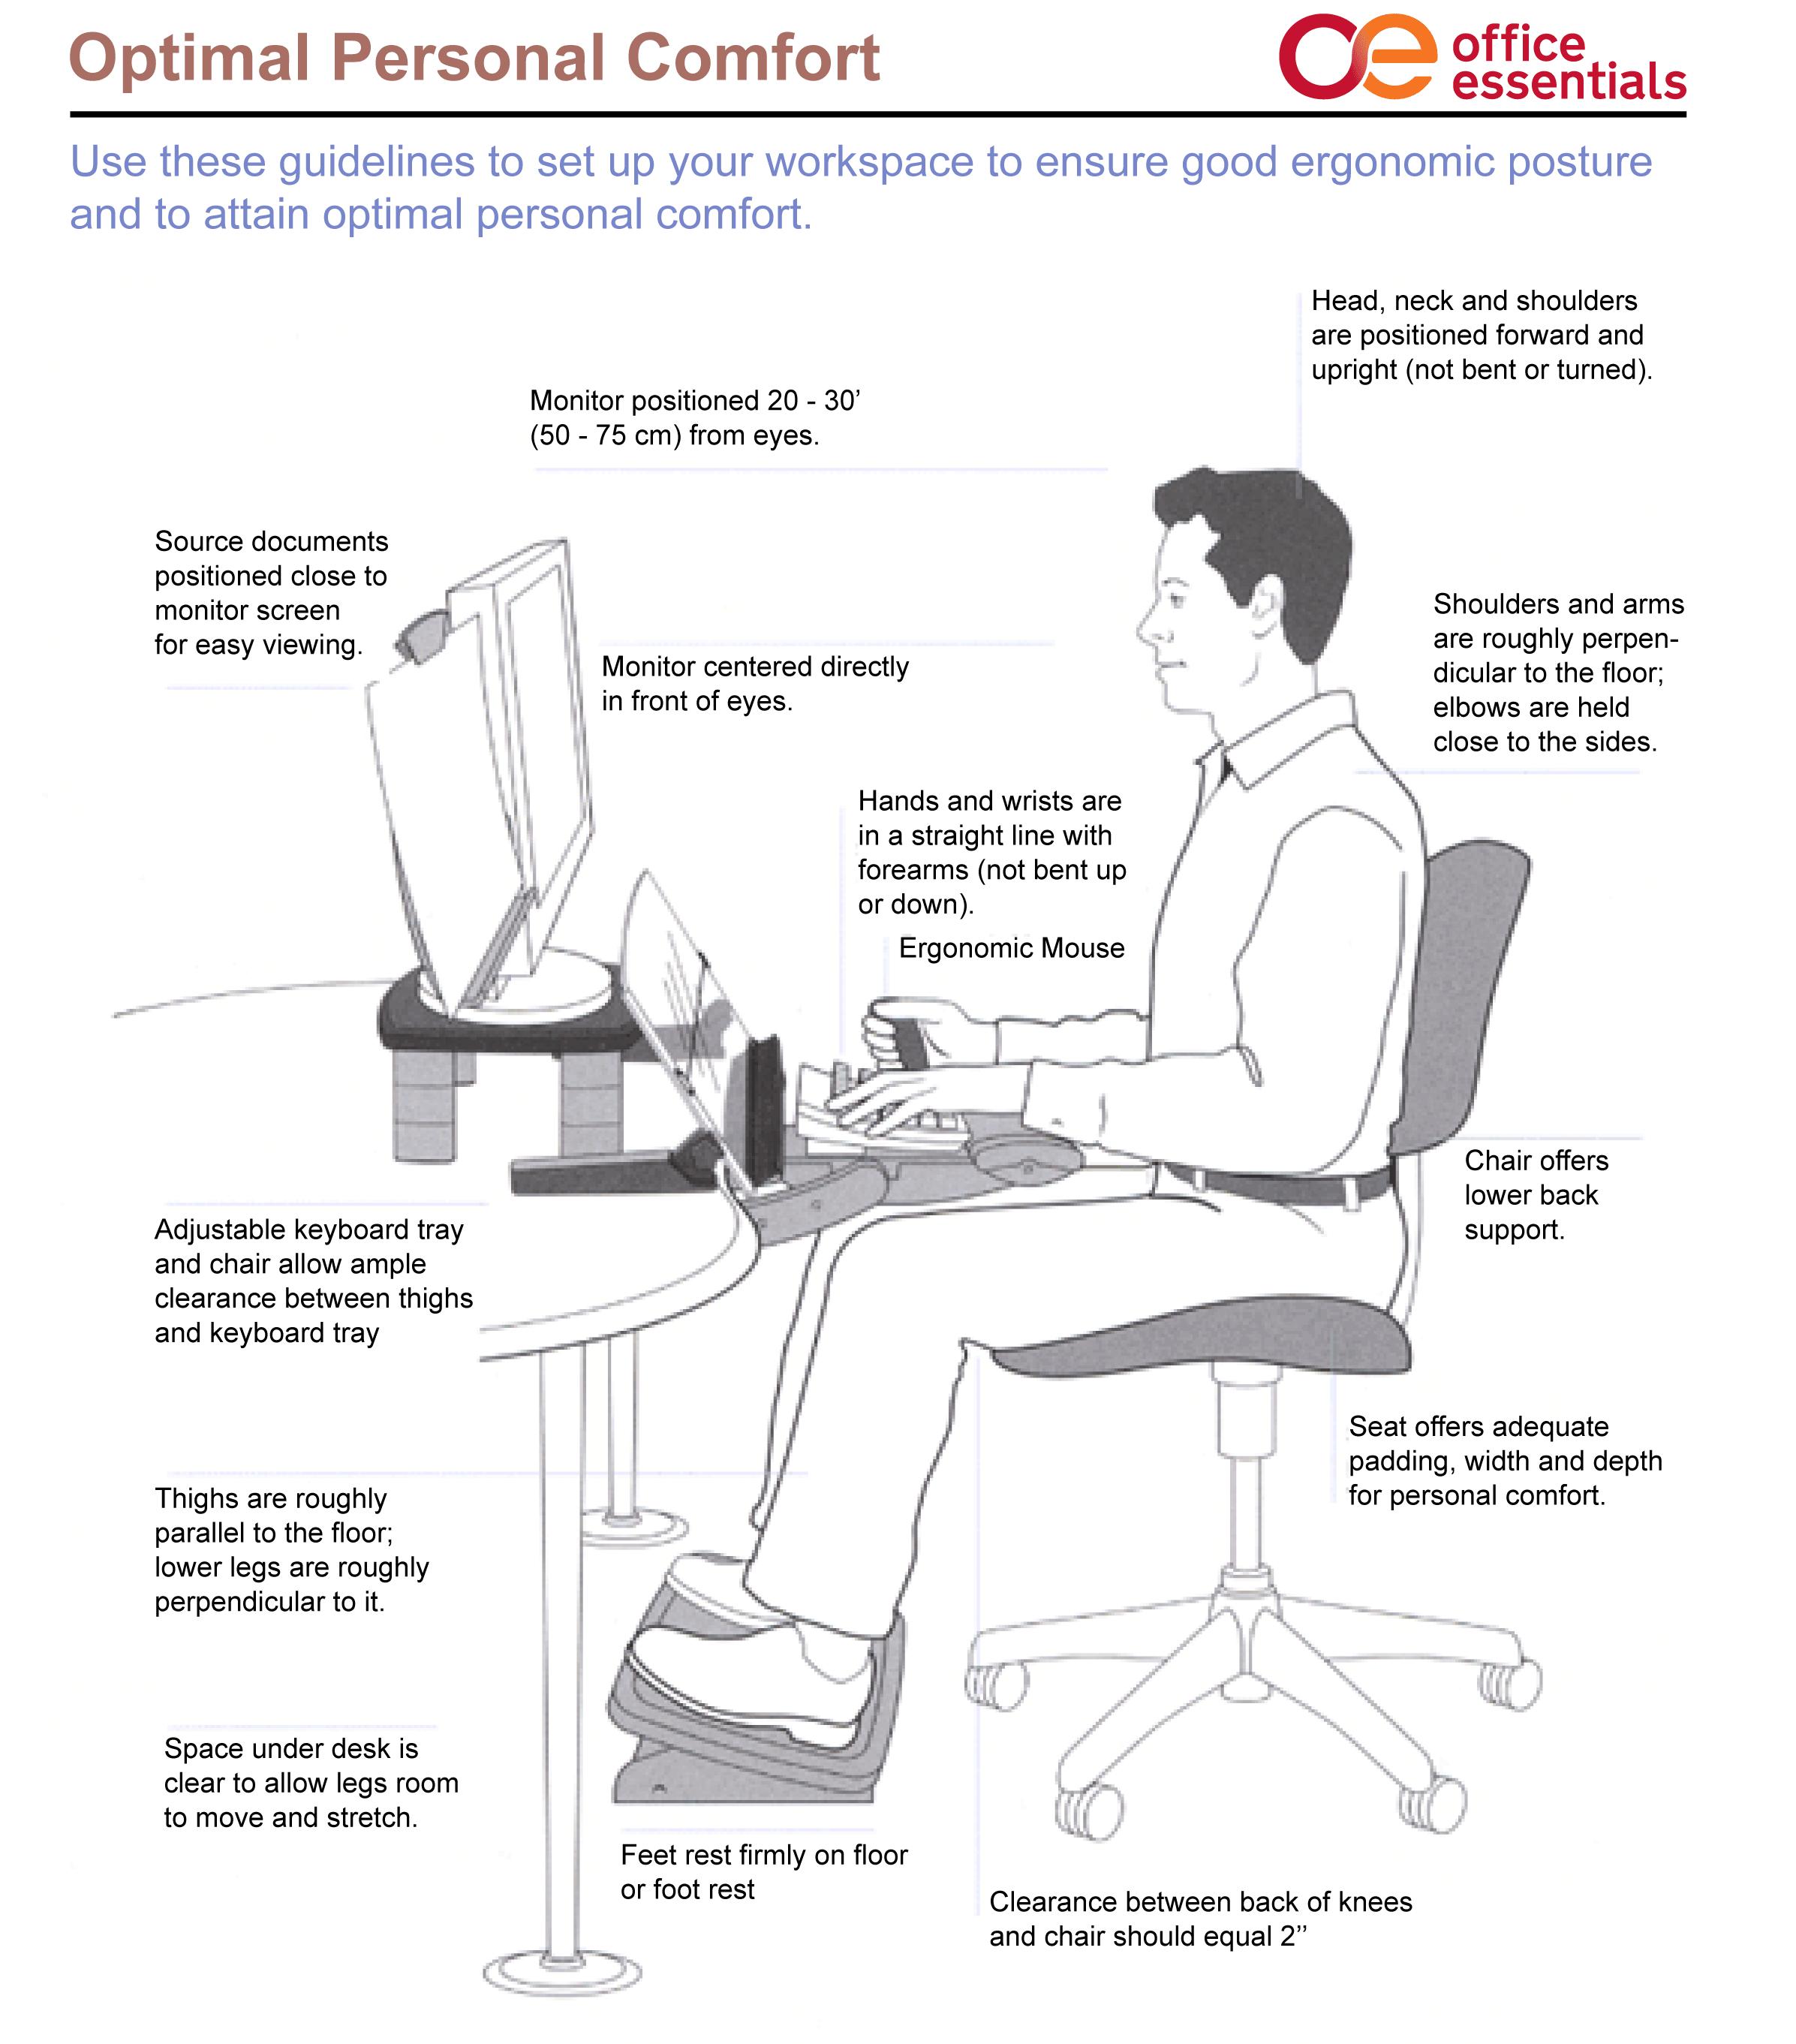 Good Ergonomic posture tips for optimal comfort at work